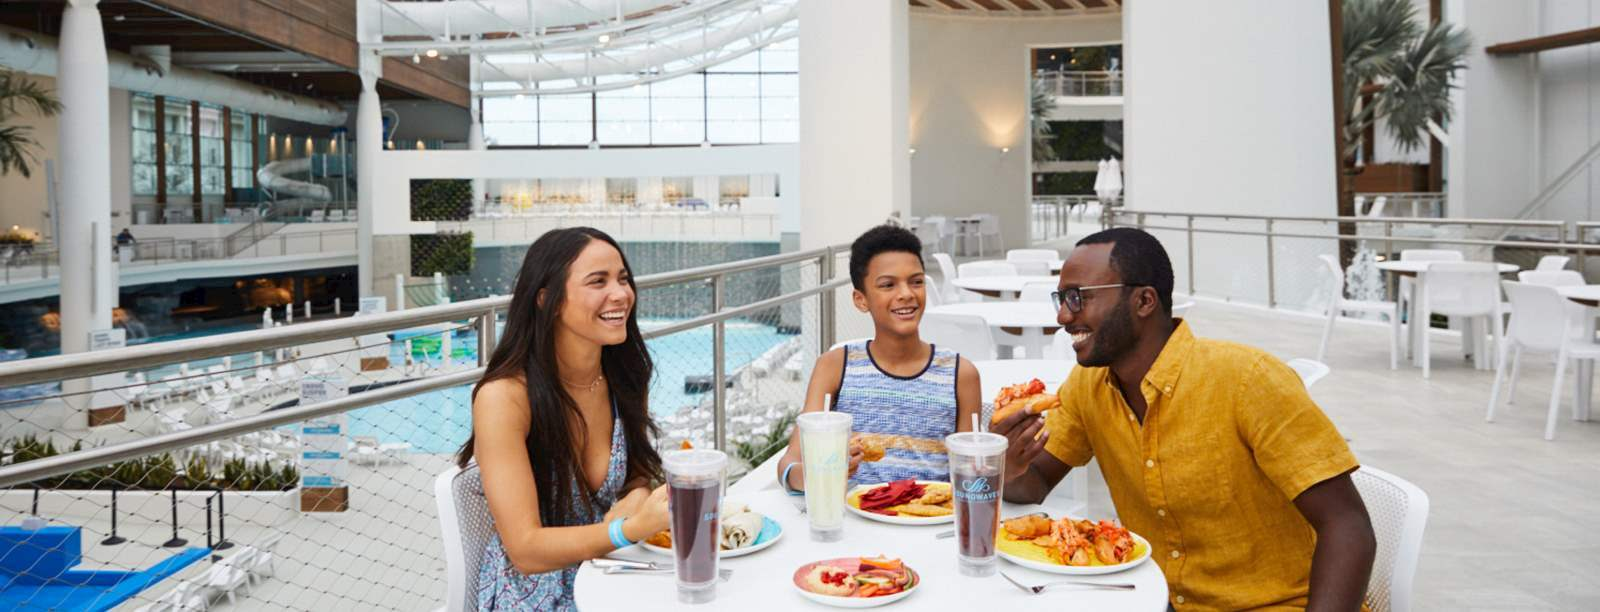 Restaurants And Bars in Nashville Resort